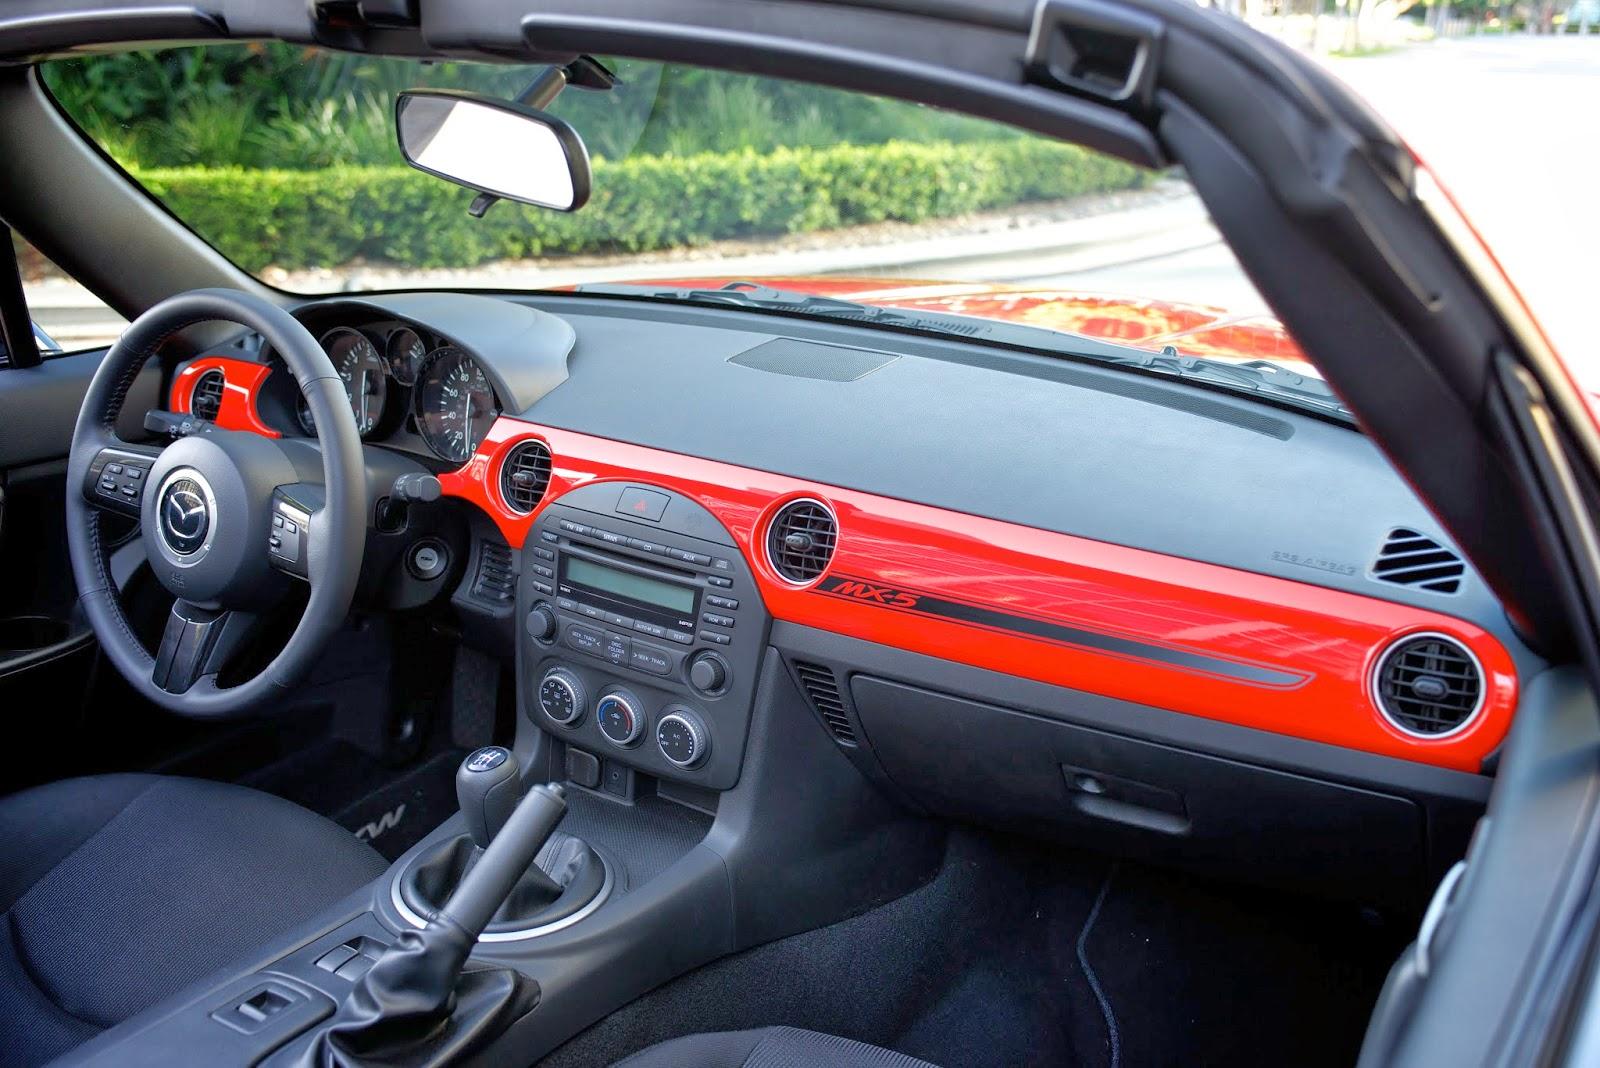 Interior shot of a 2014 Mazda MX-5 Miata Club